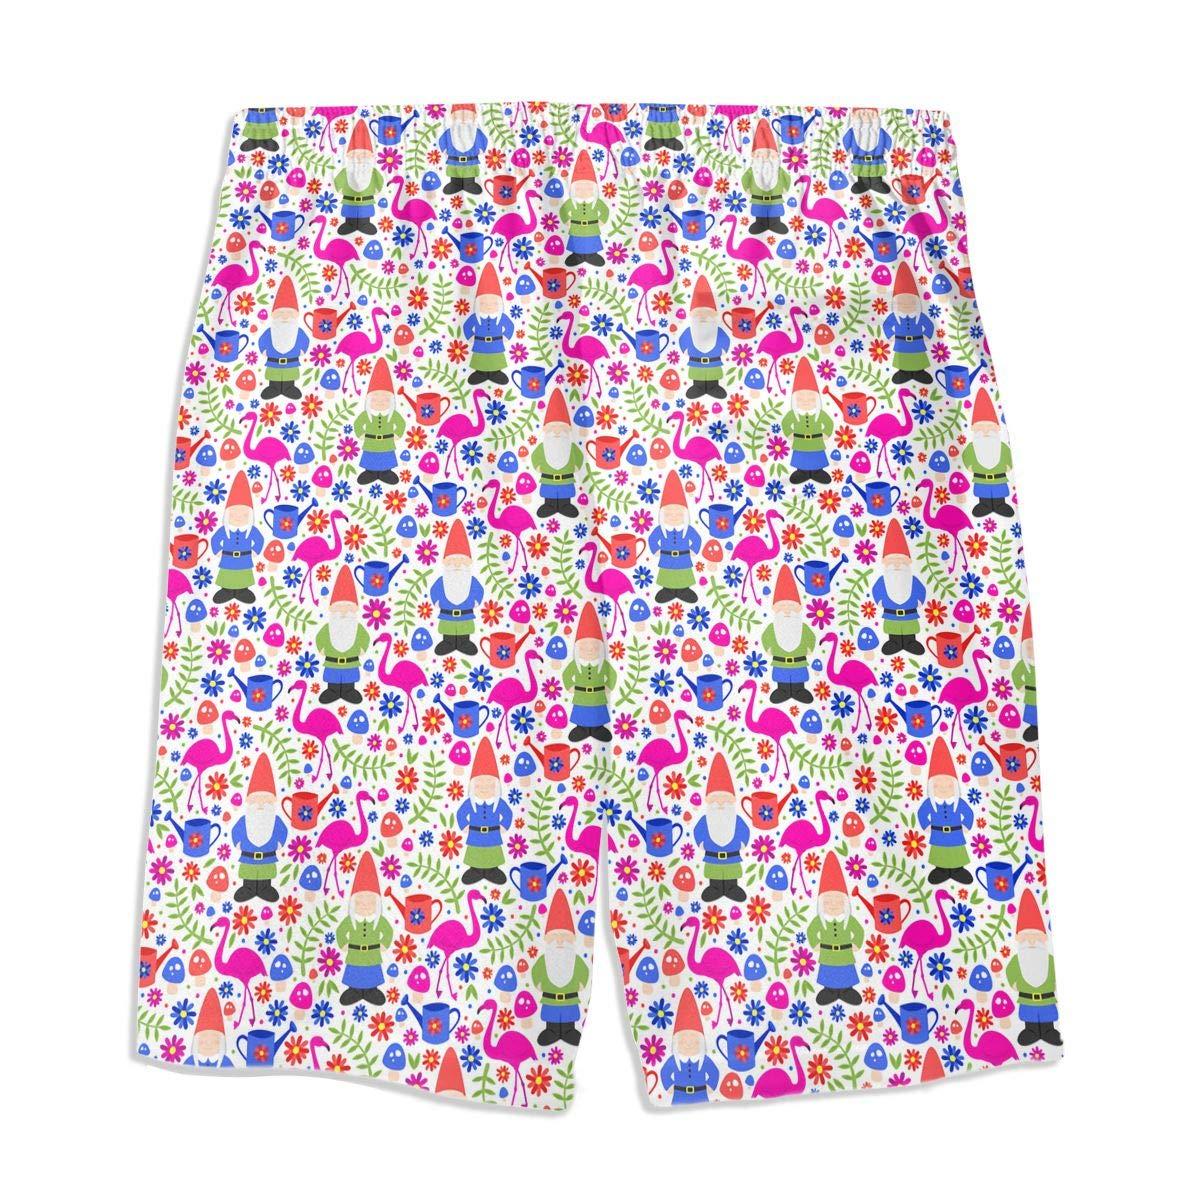 Chrismas Santa Flamingo Flower Woodland White Teen Swim Trunks Bathing Suit Shorts Board Beach